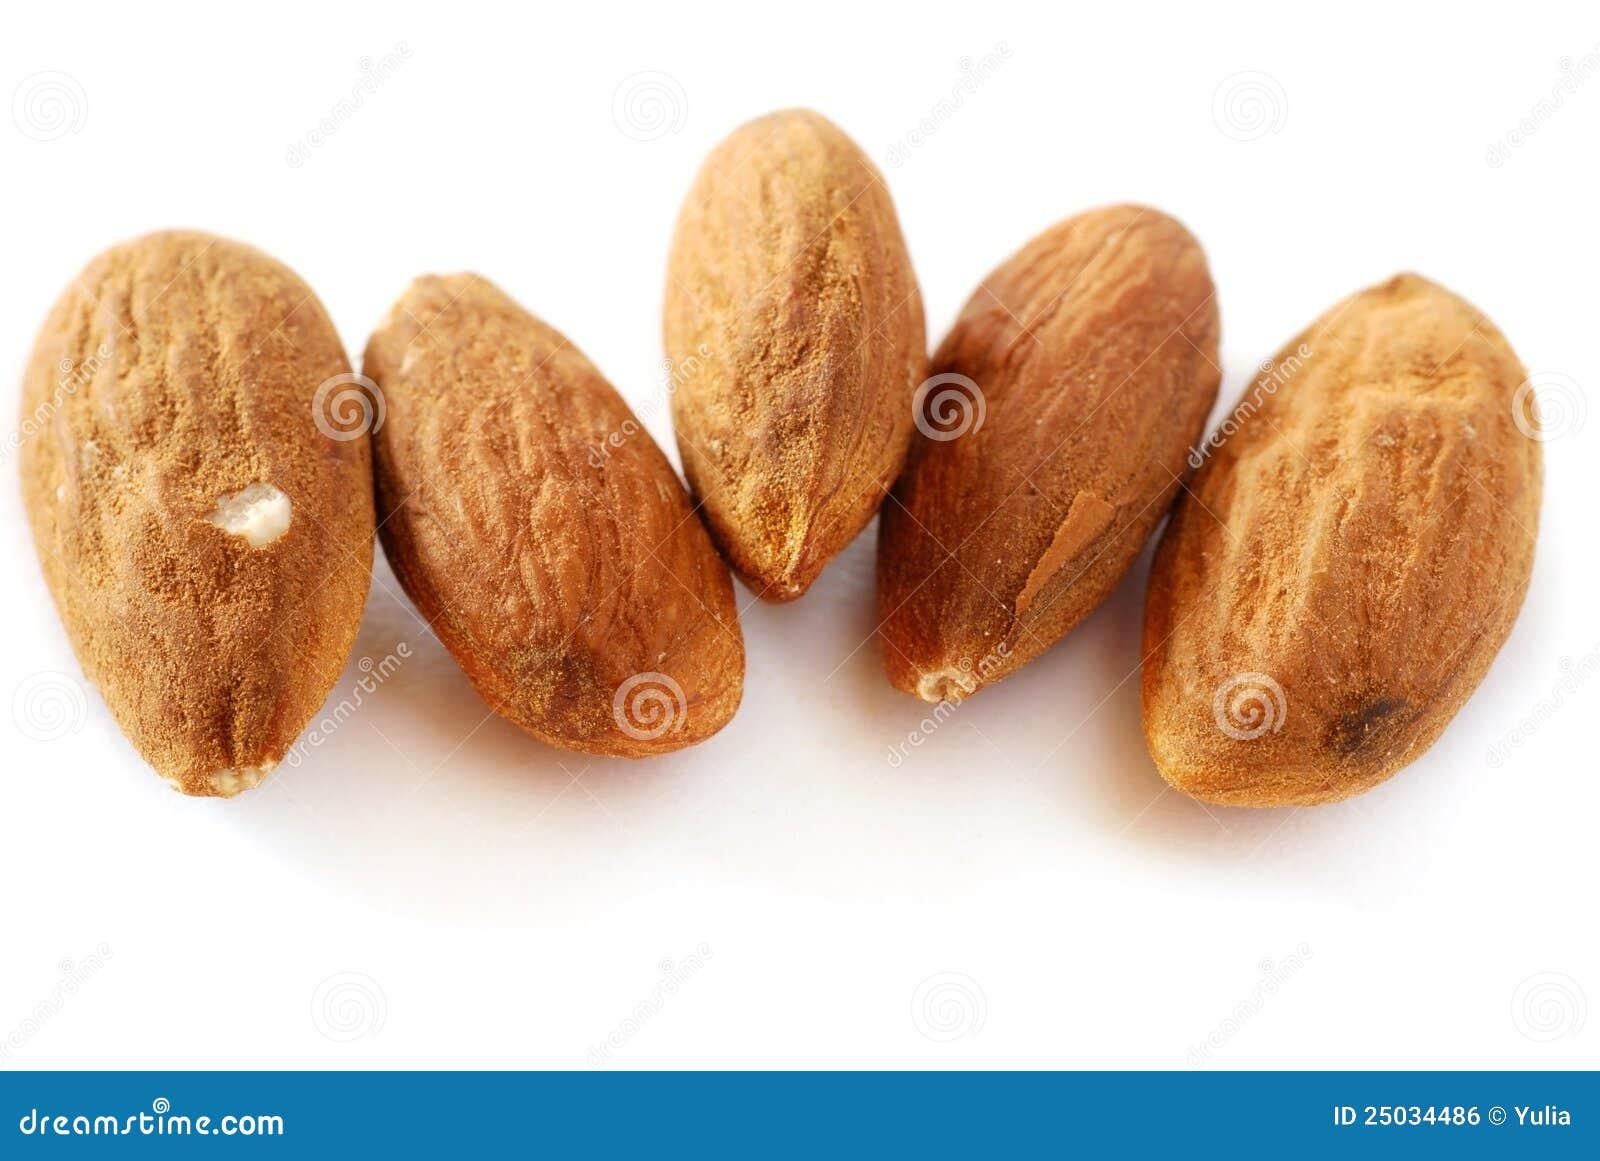 black almonds